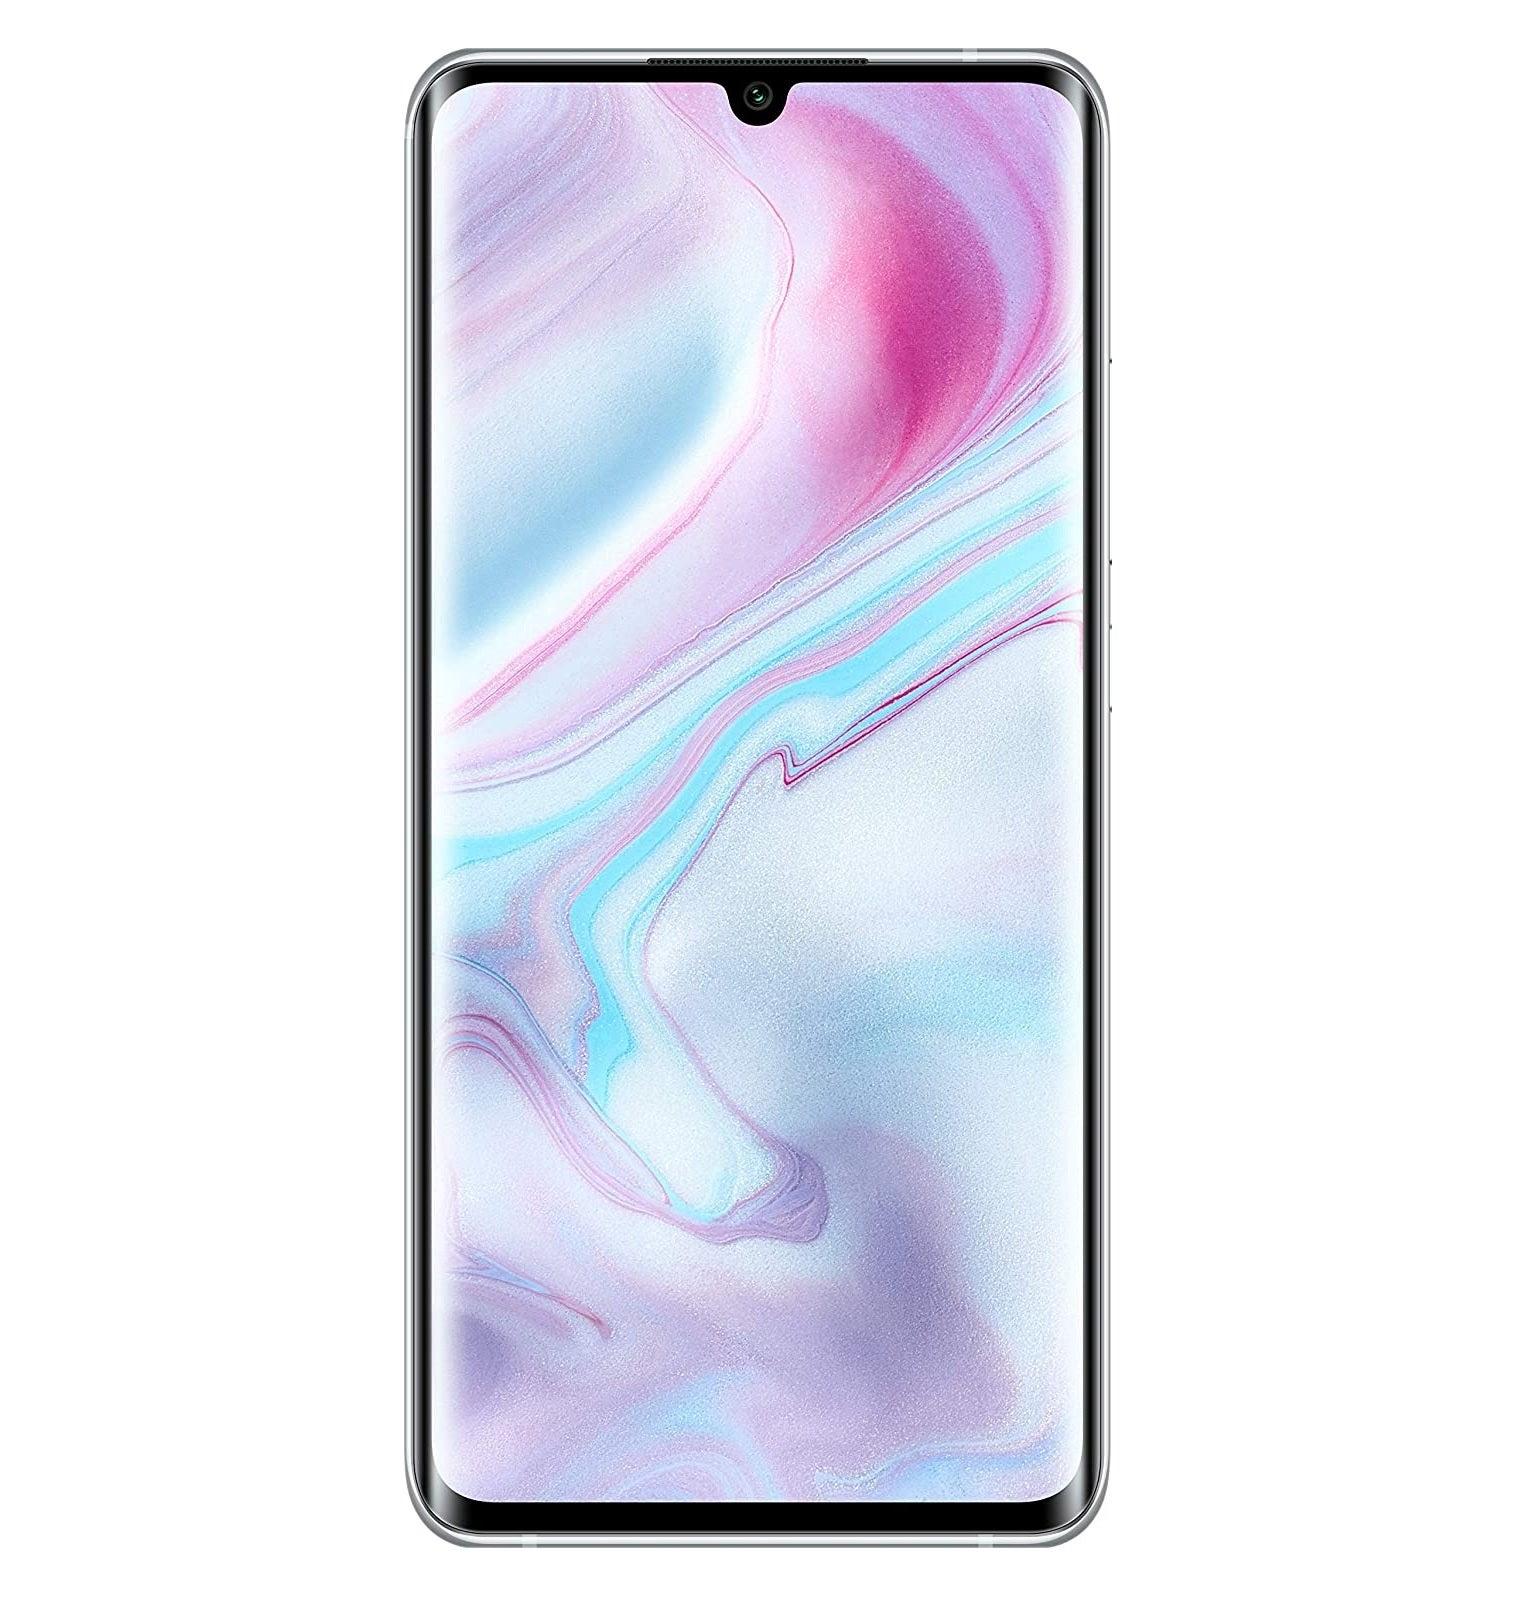 Xiaomi Mi Note 10 Refurbished 4G Mobile Phone